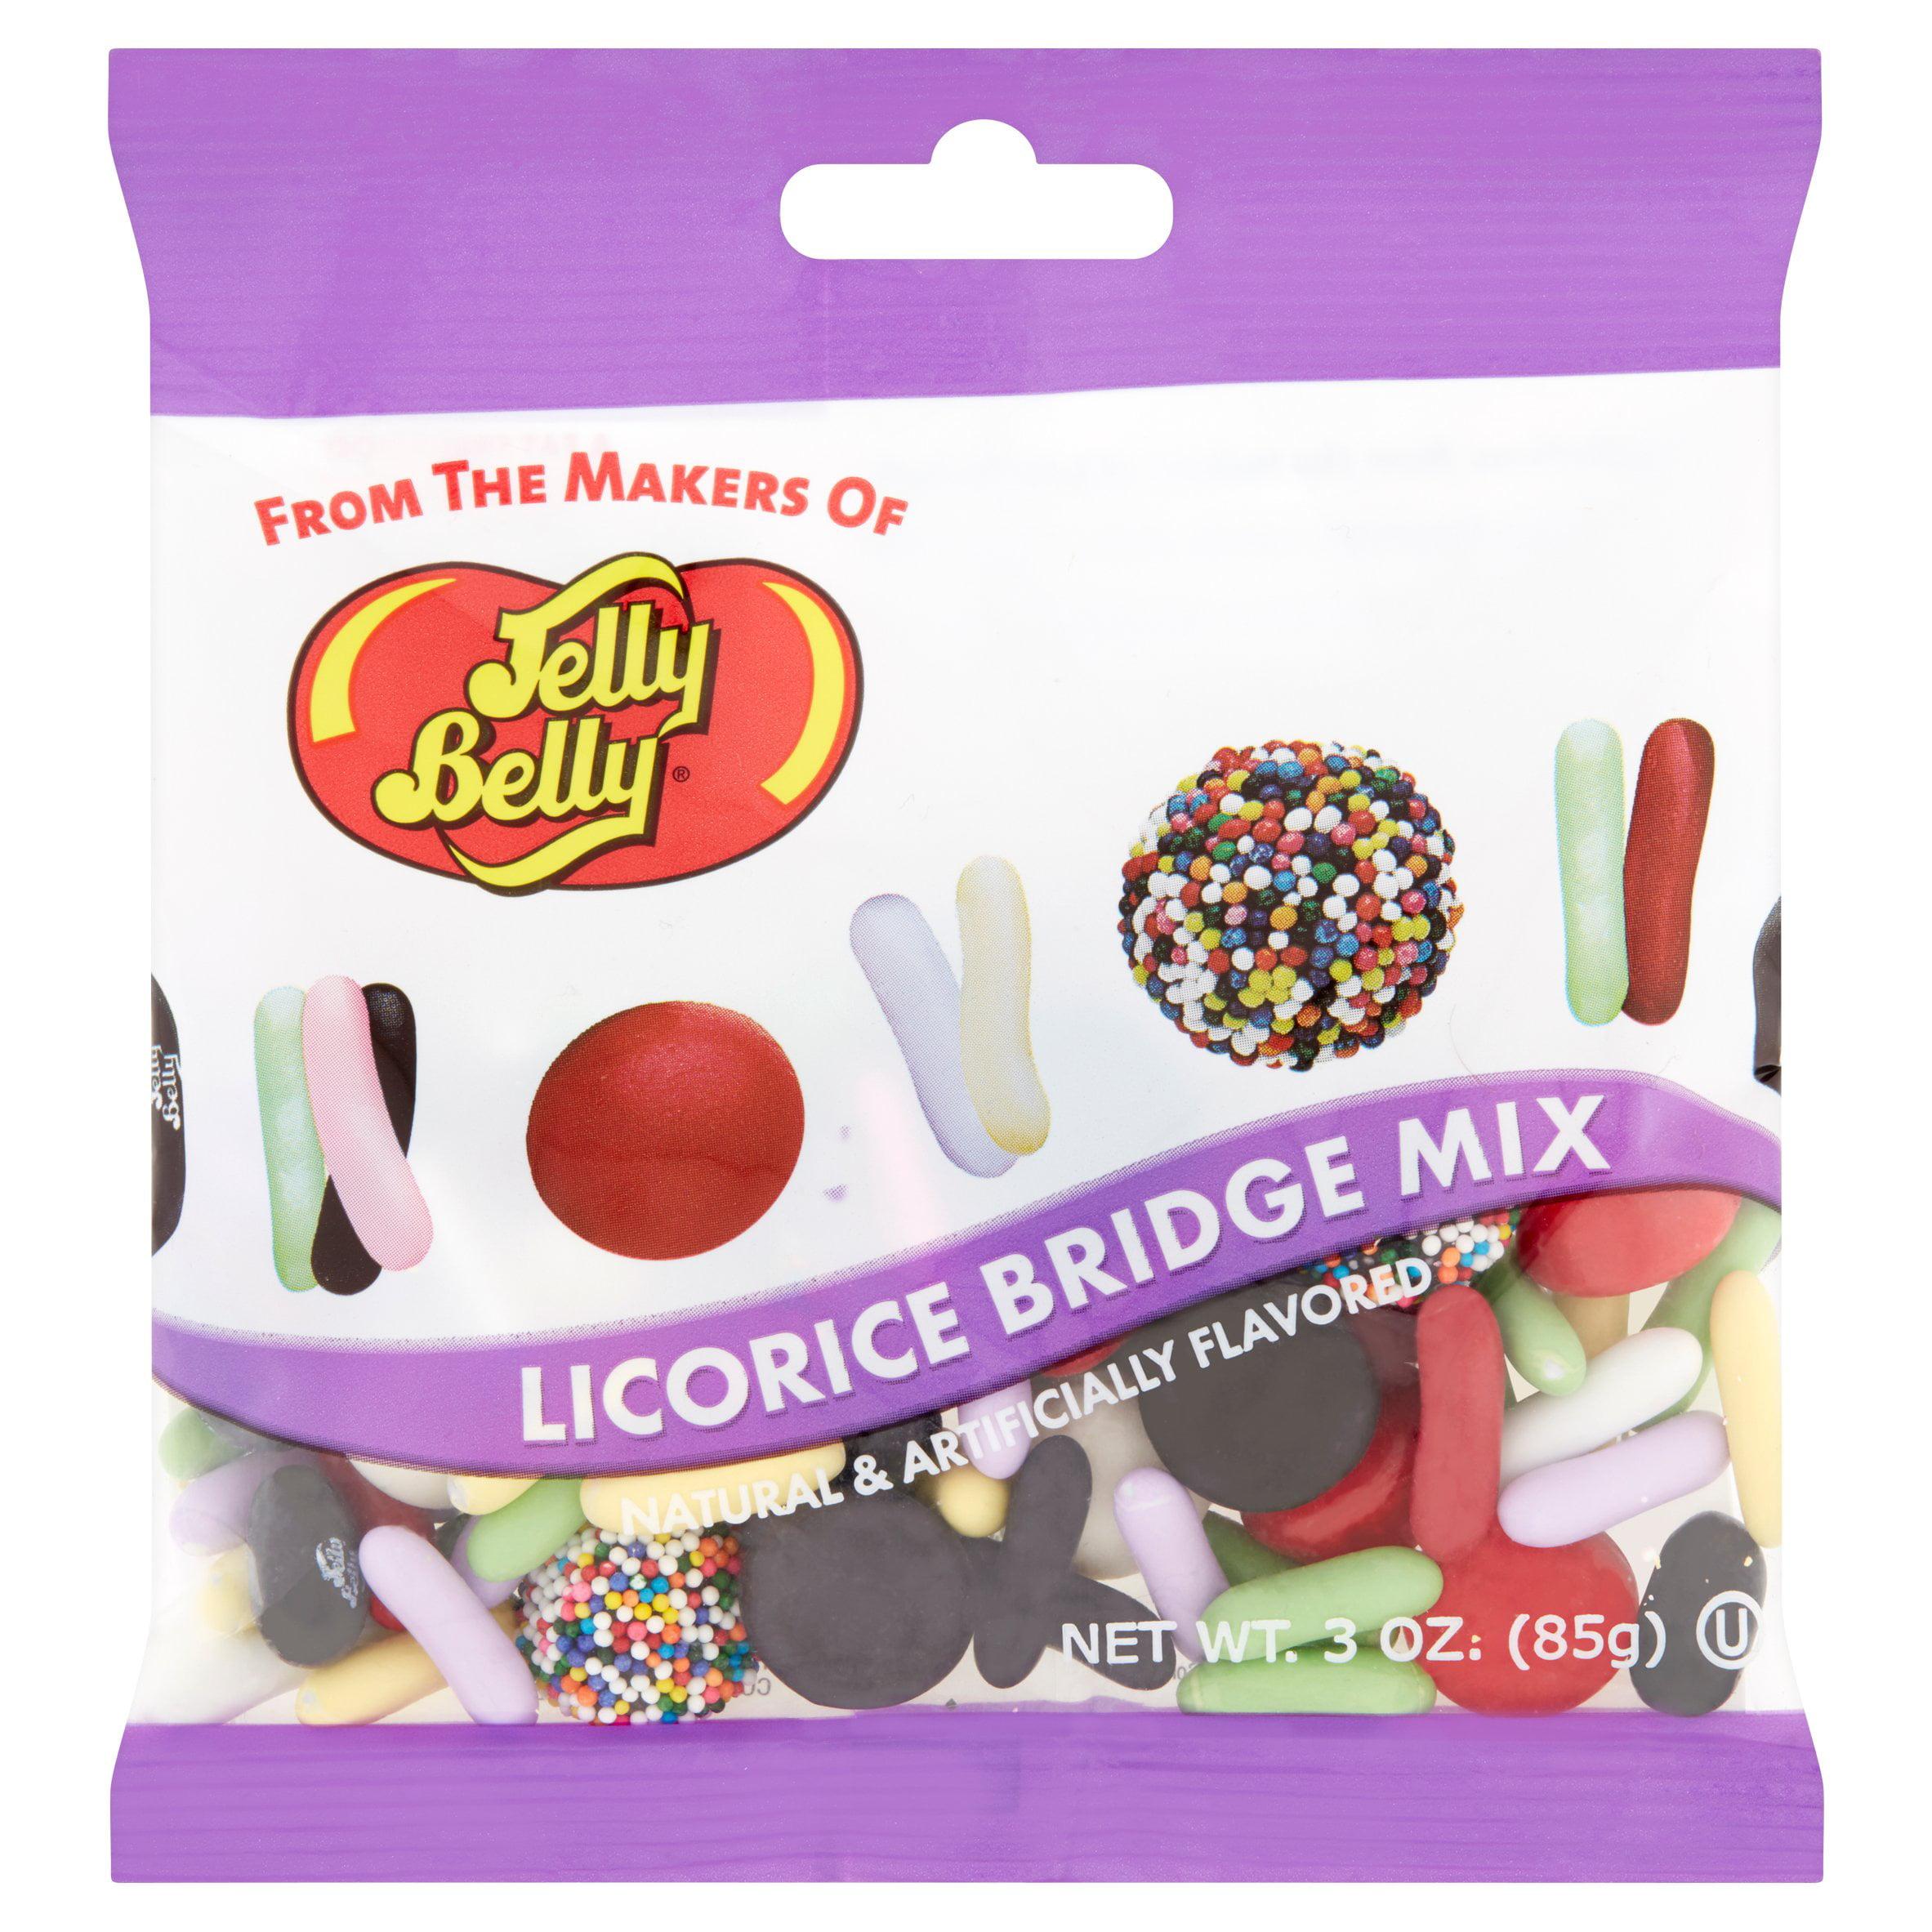 (4 Pack) Jelly Belly, Licorice Bridge Mix, 3 Oz